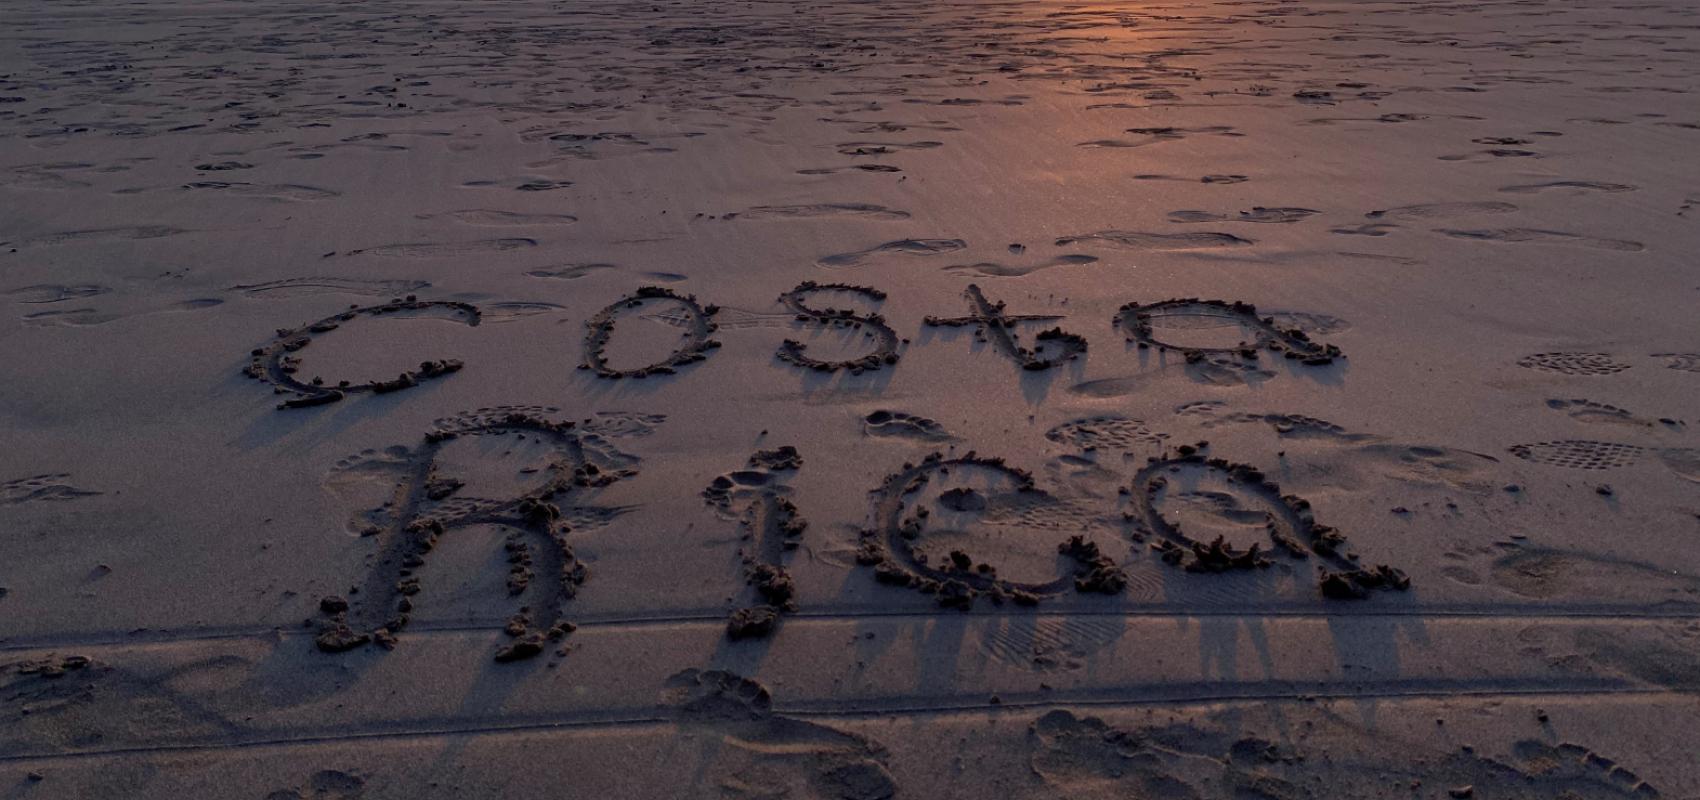 Costa Rica written in the sand